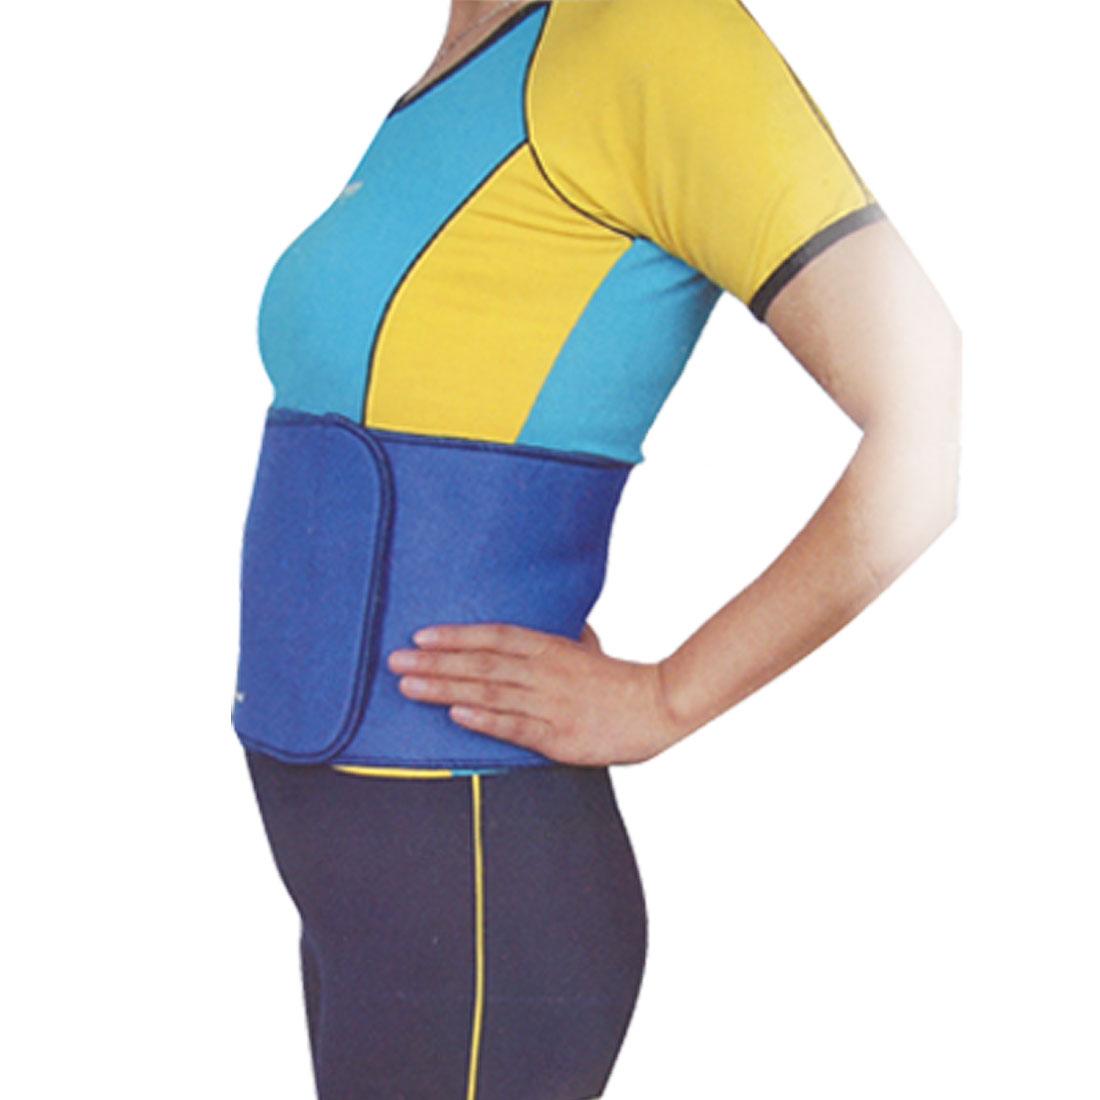 Blue Neoprene Elastic Waist Abdomen Brace Support One Size